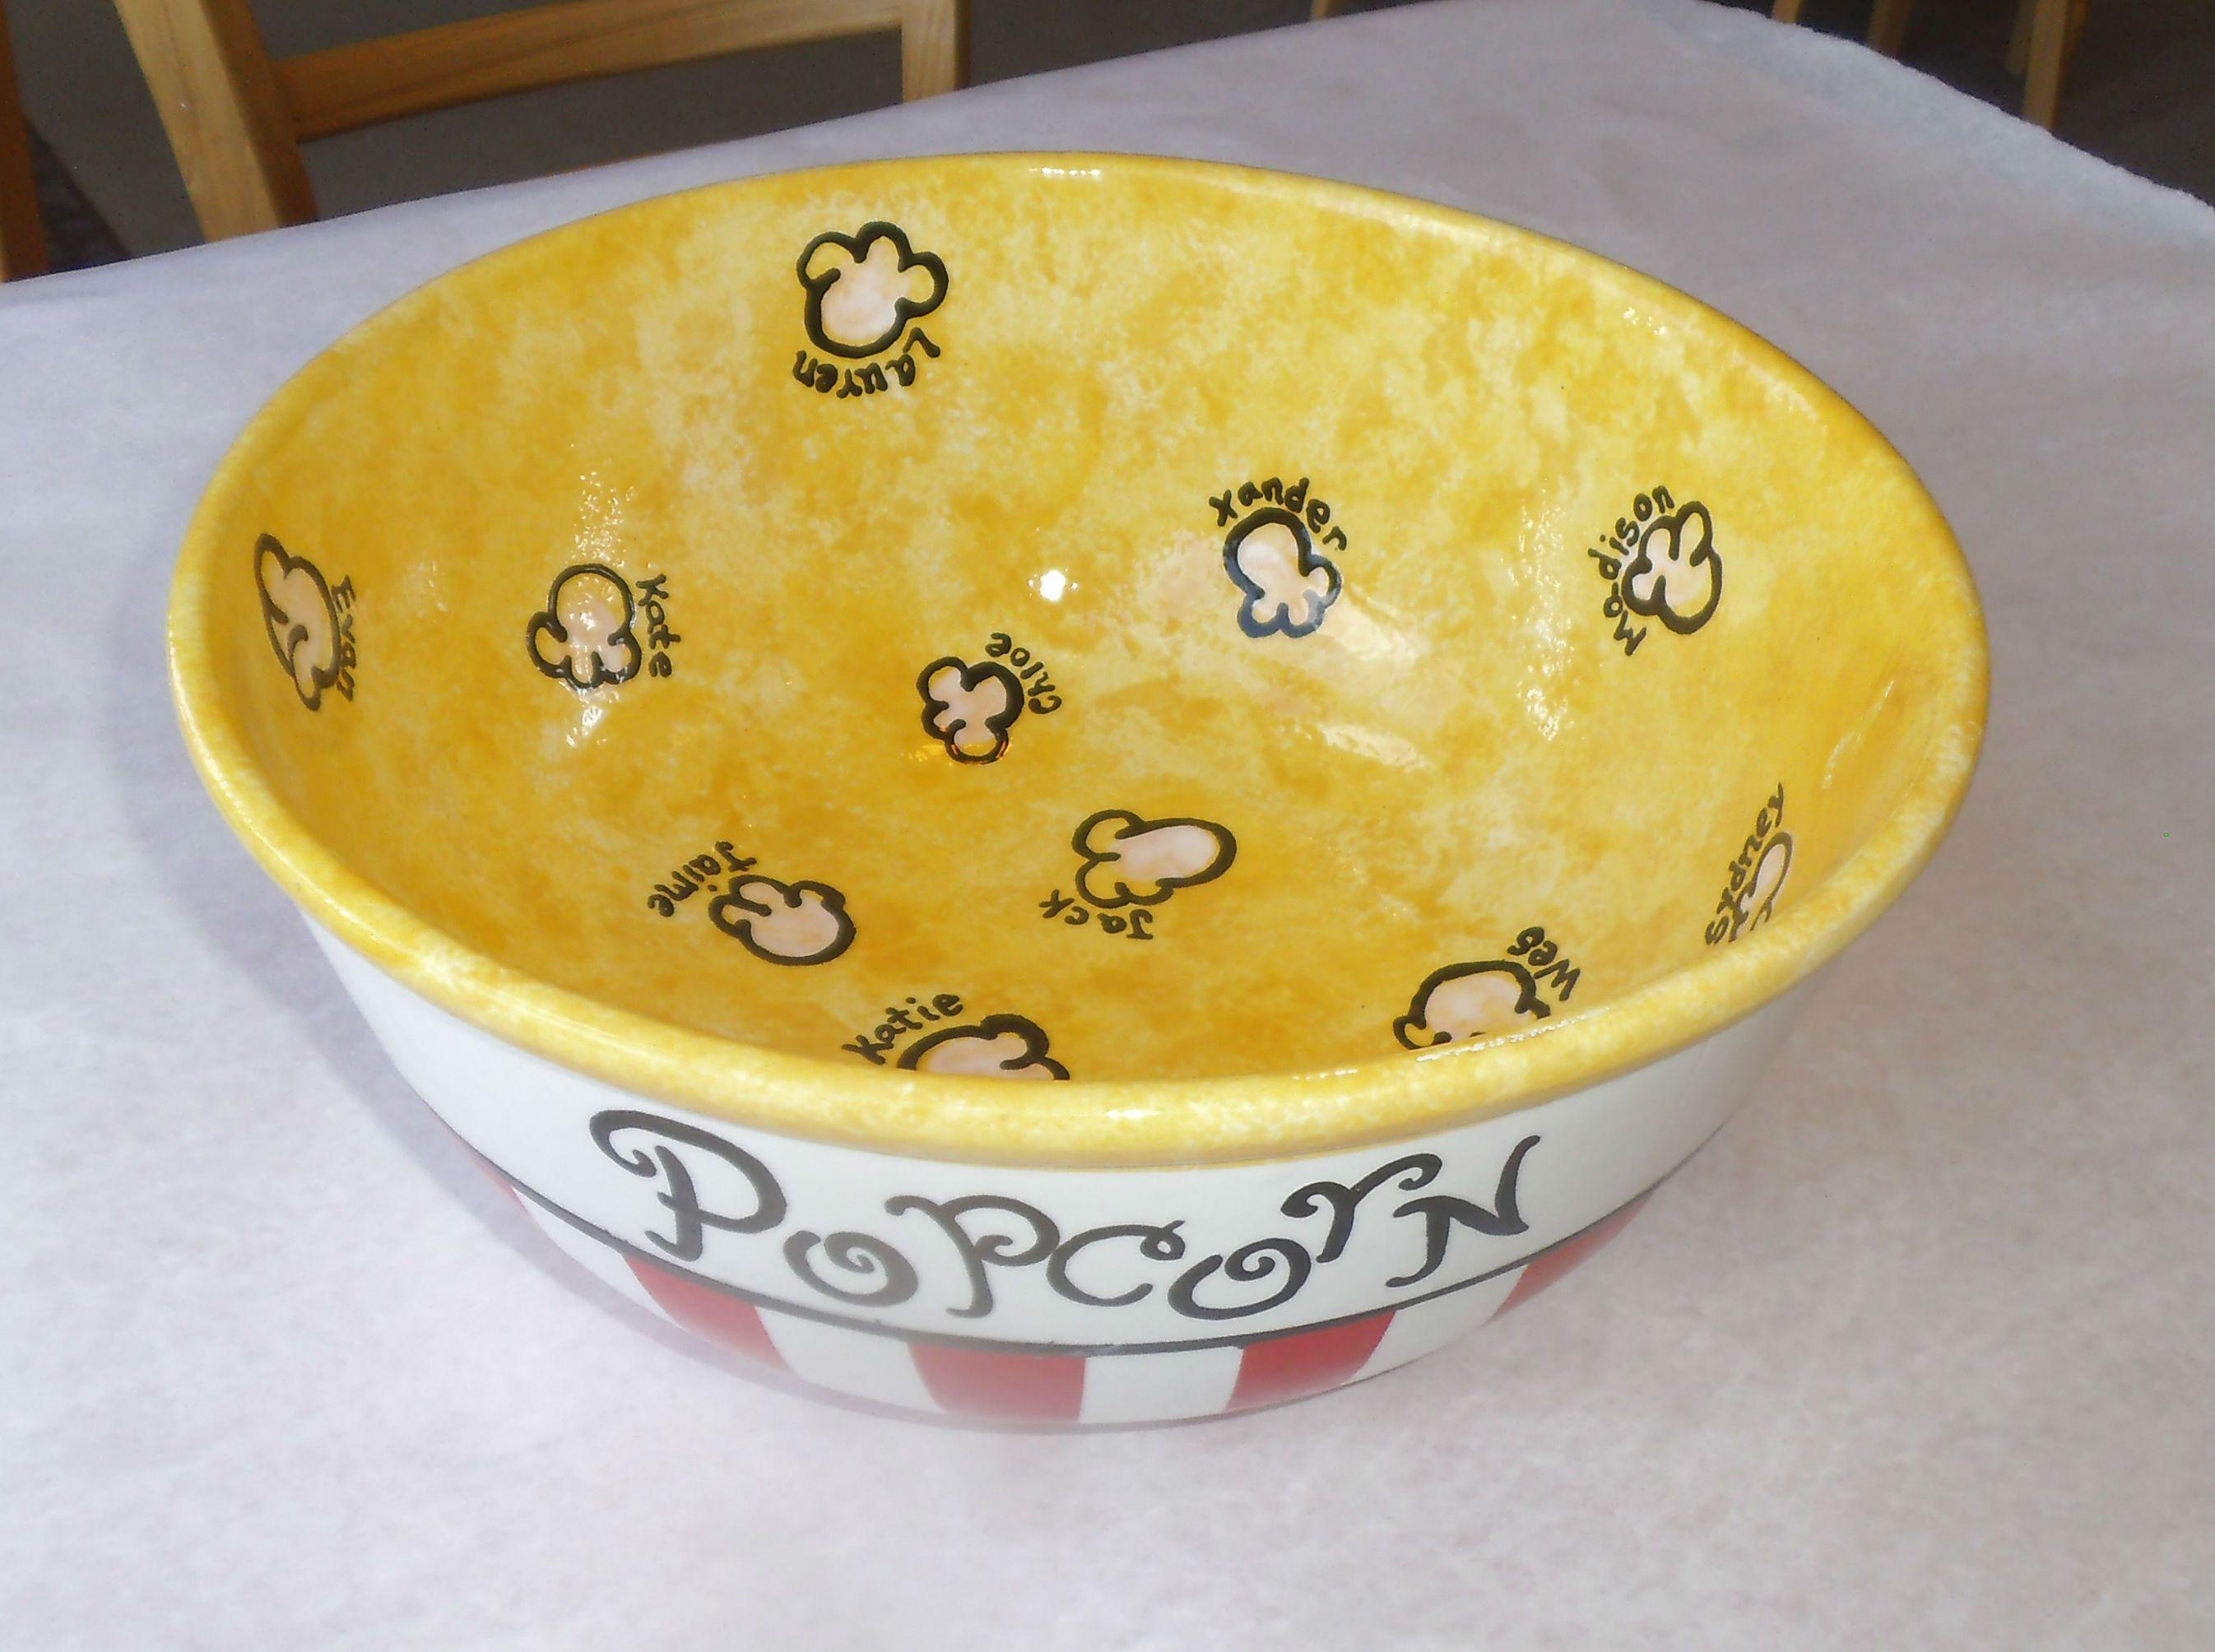 fingerprint Popcorn bowl painted by staff at Color Me Mine ...